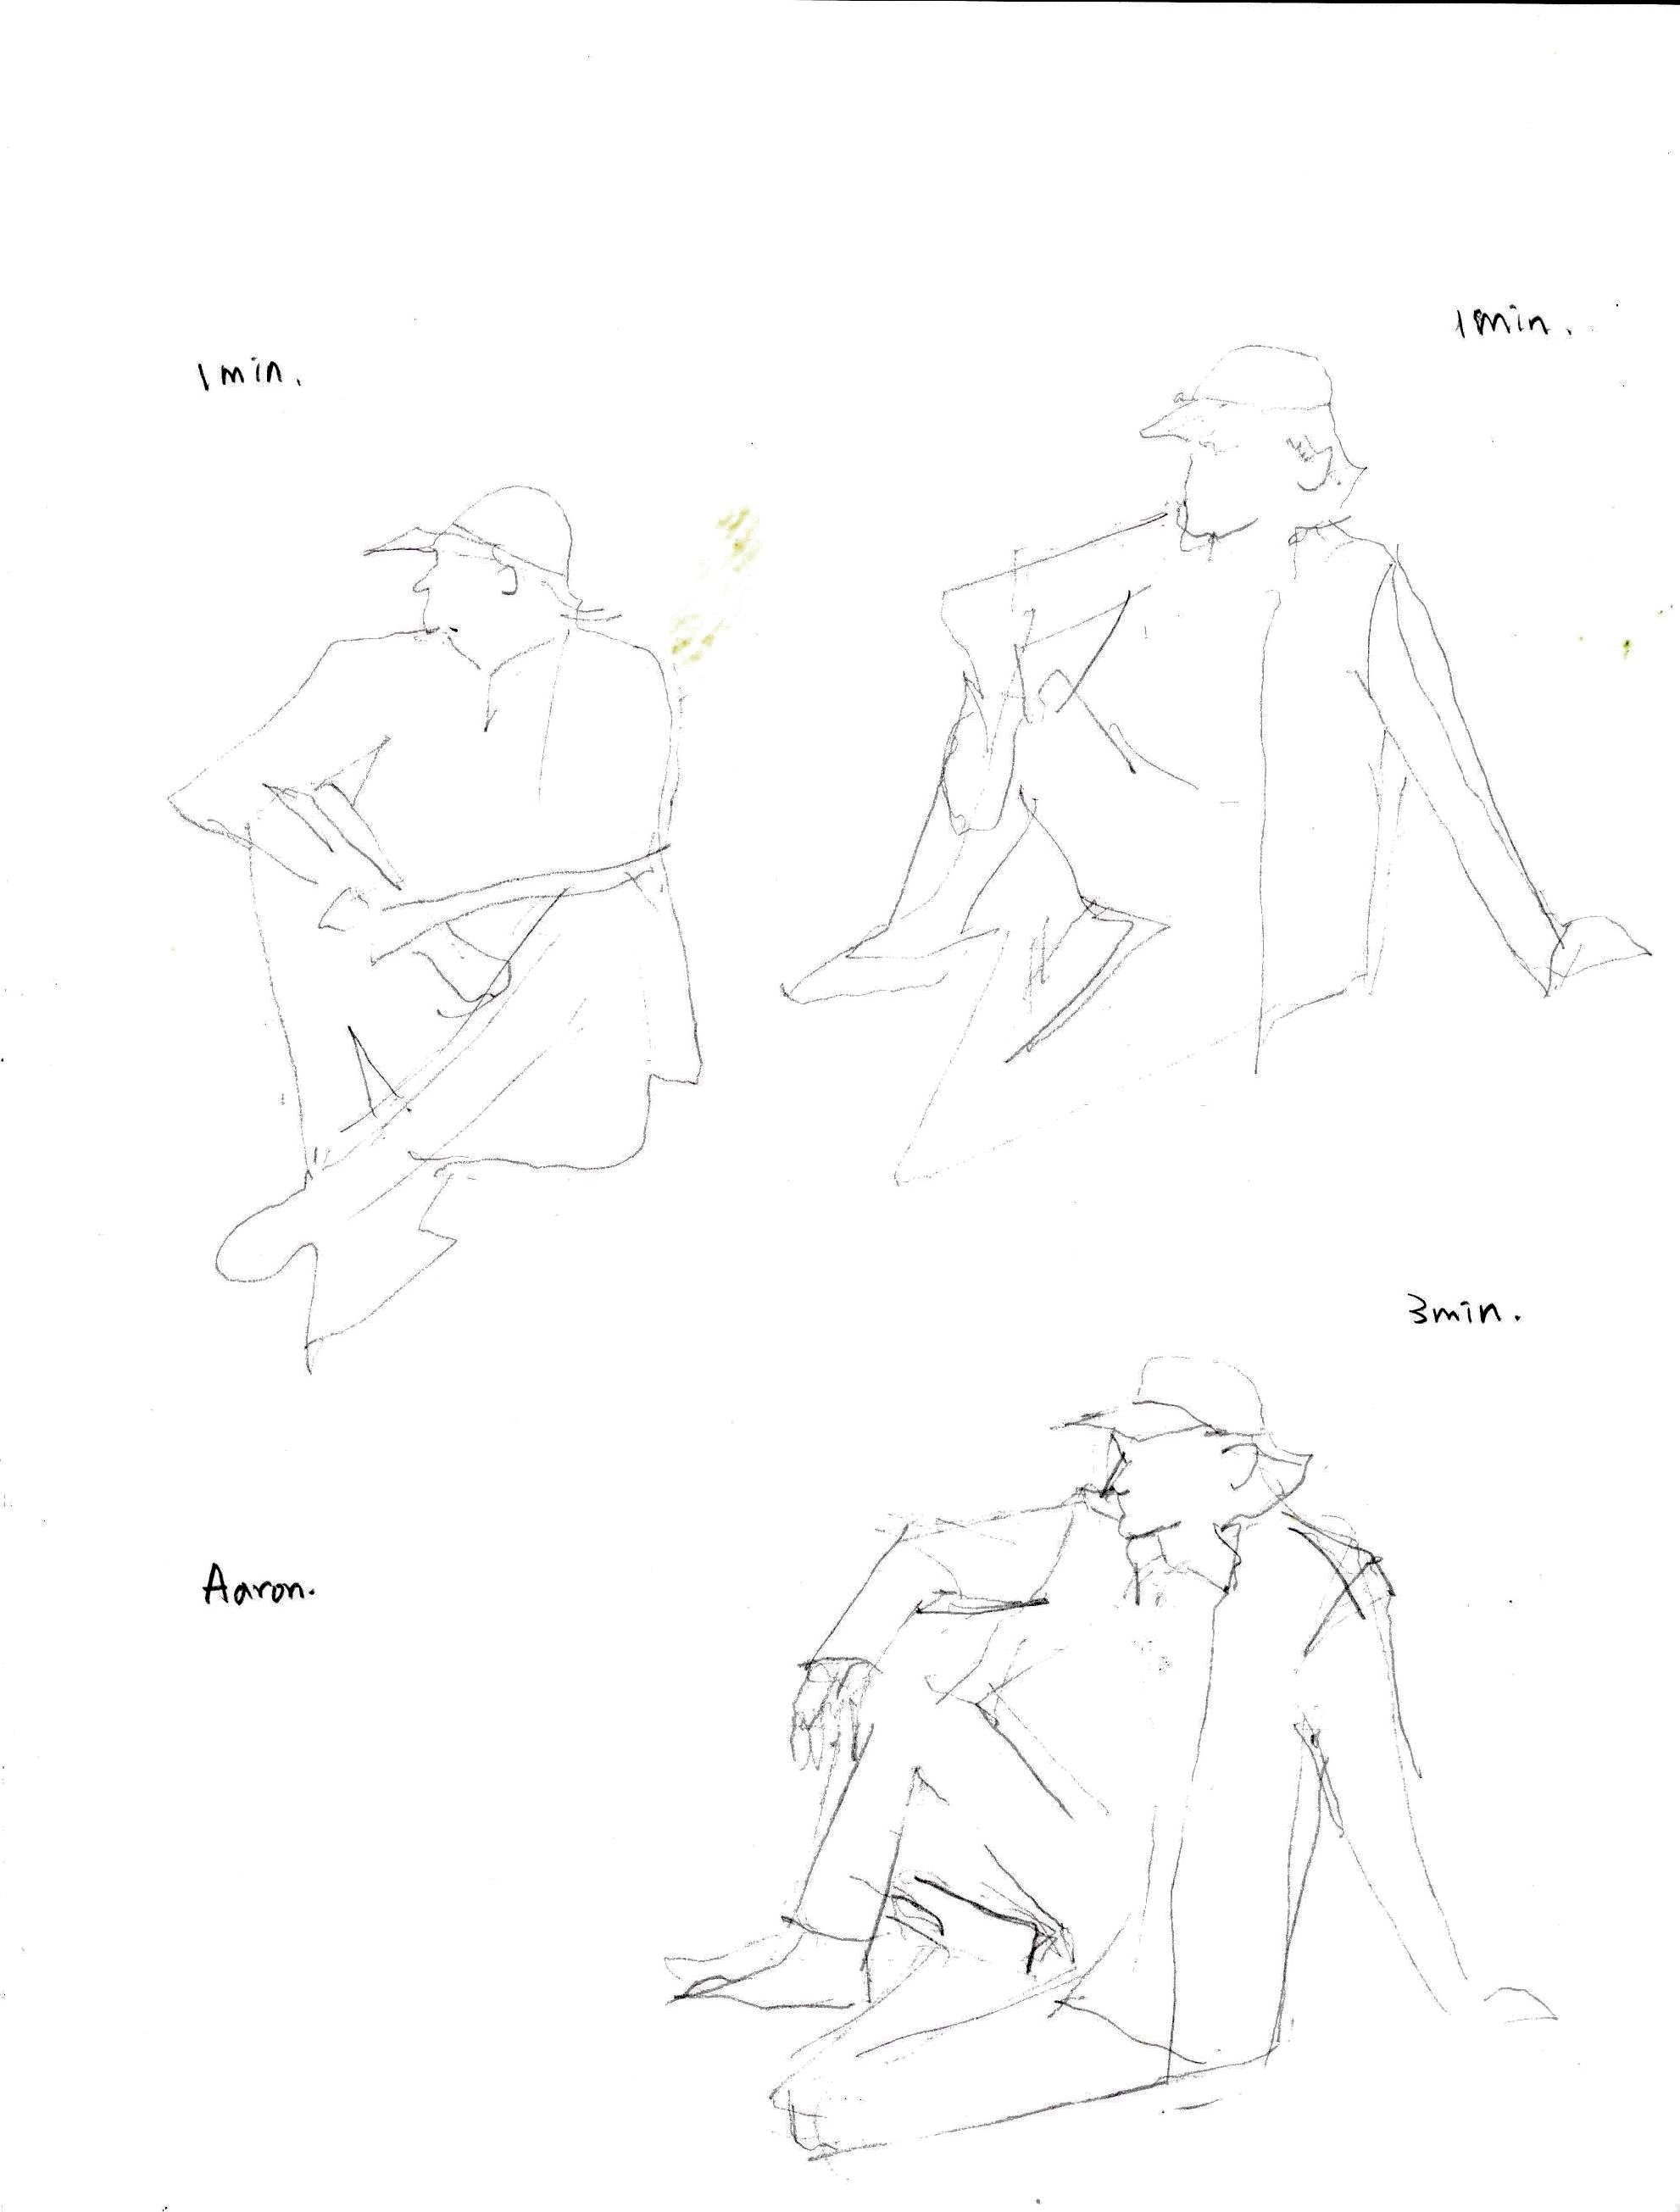 1982x2610 Drawing Human Figures 2 Creativity Through Sketching